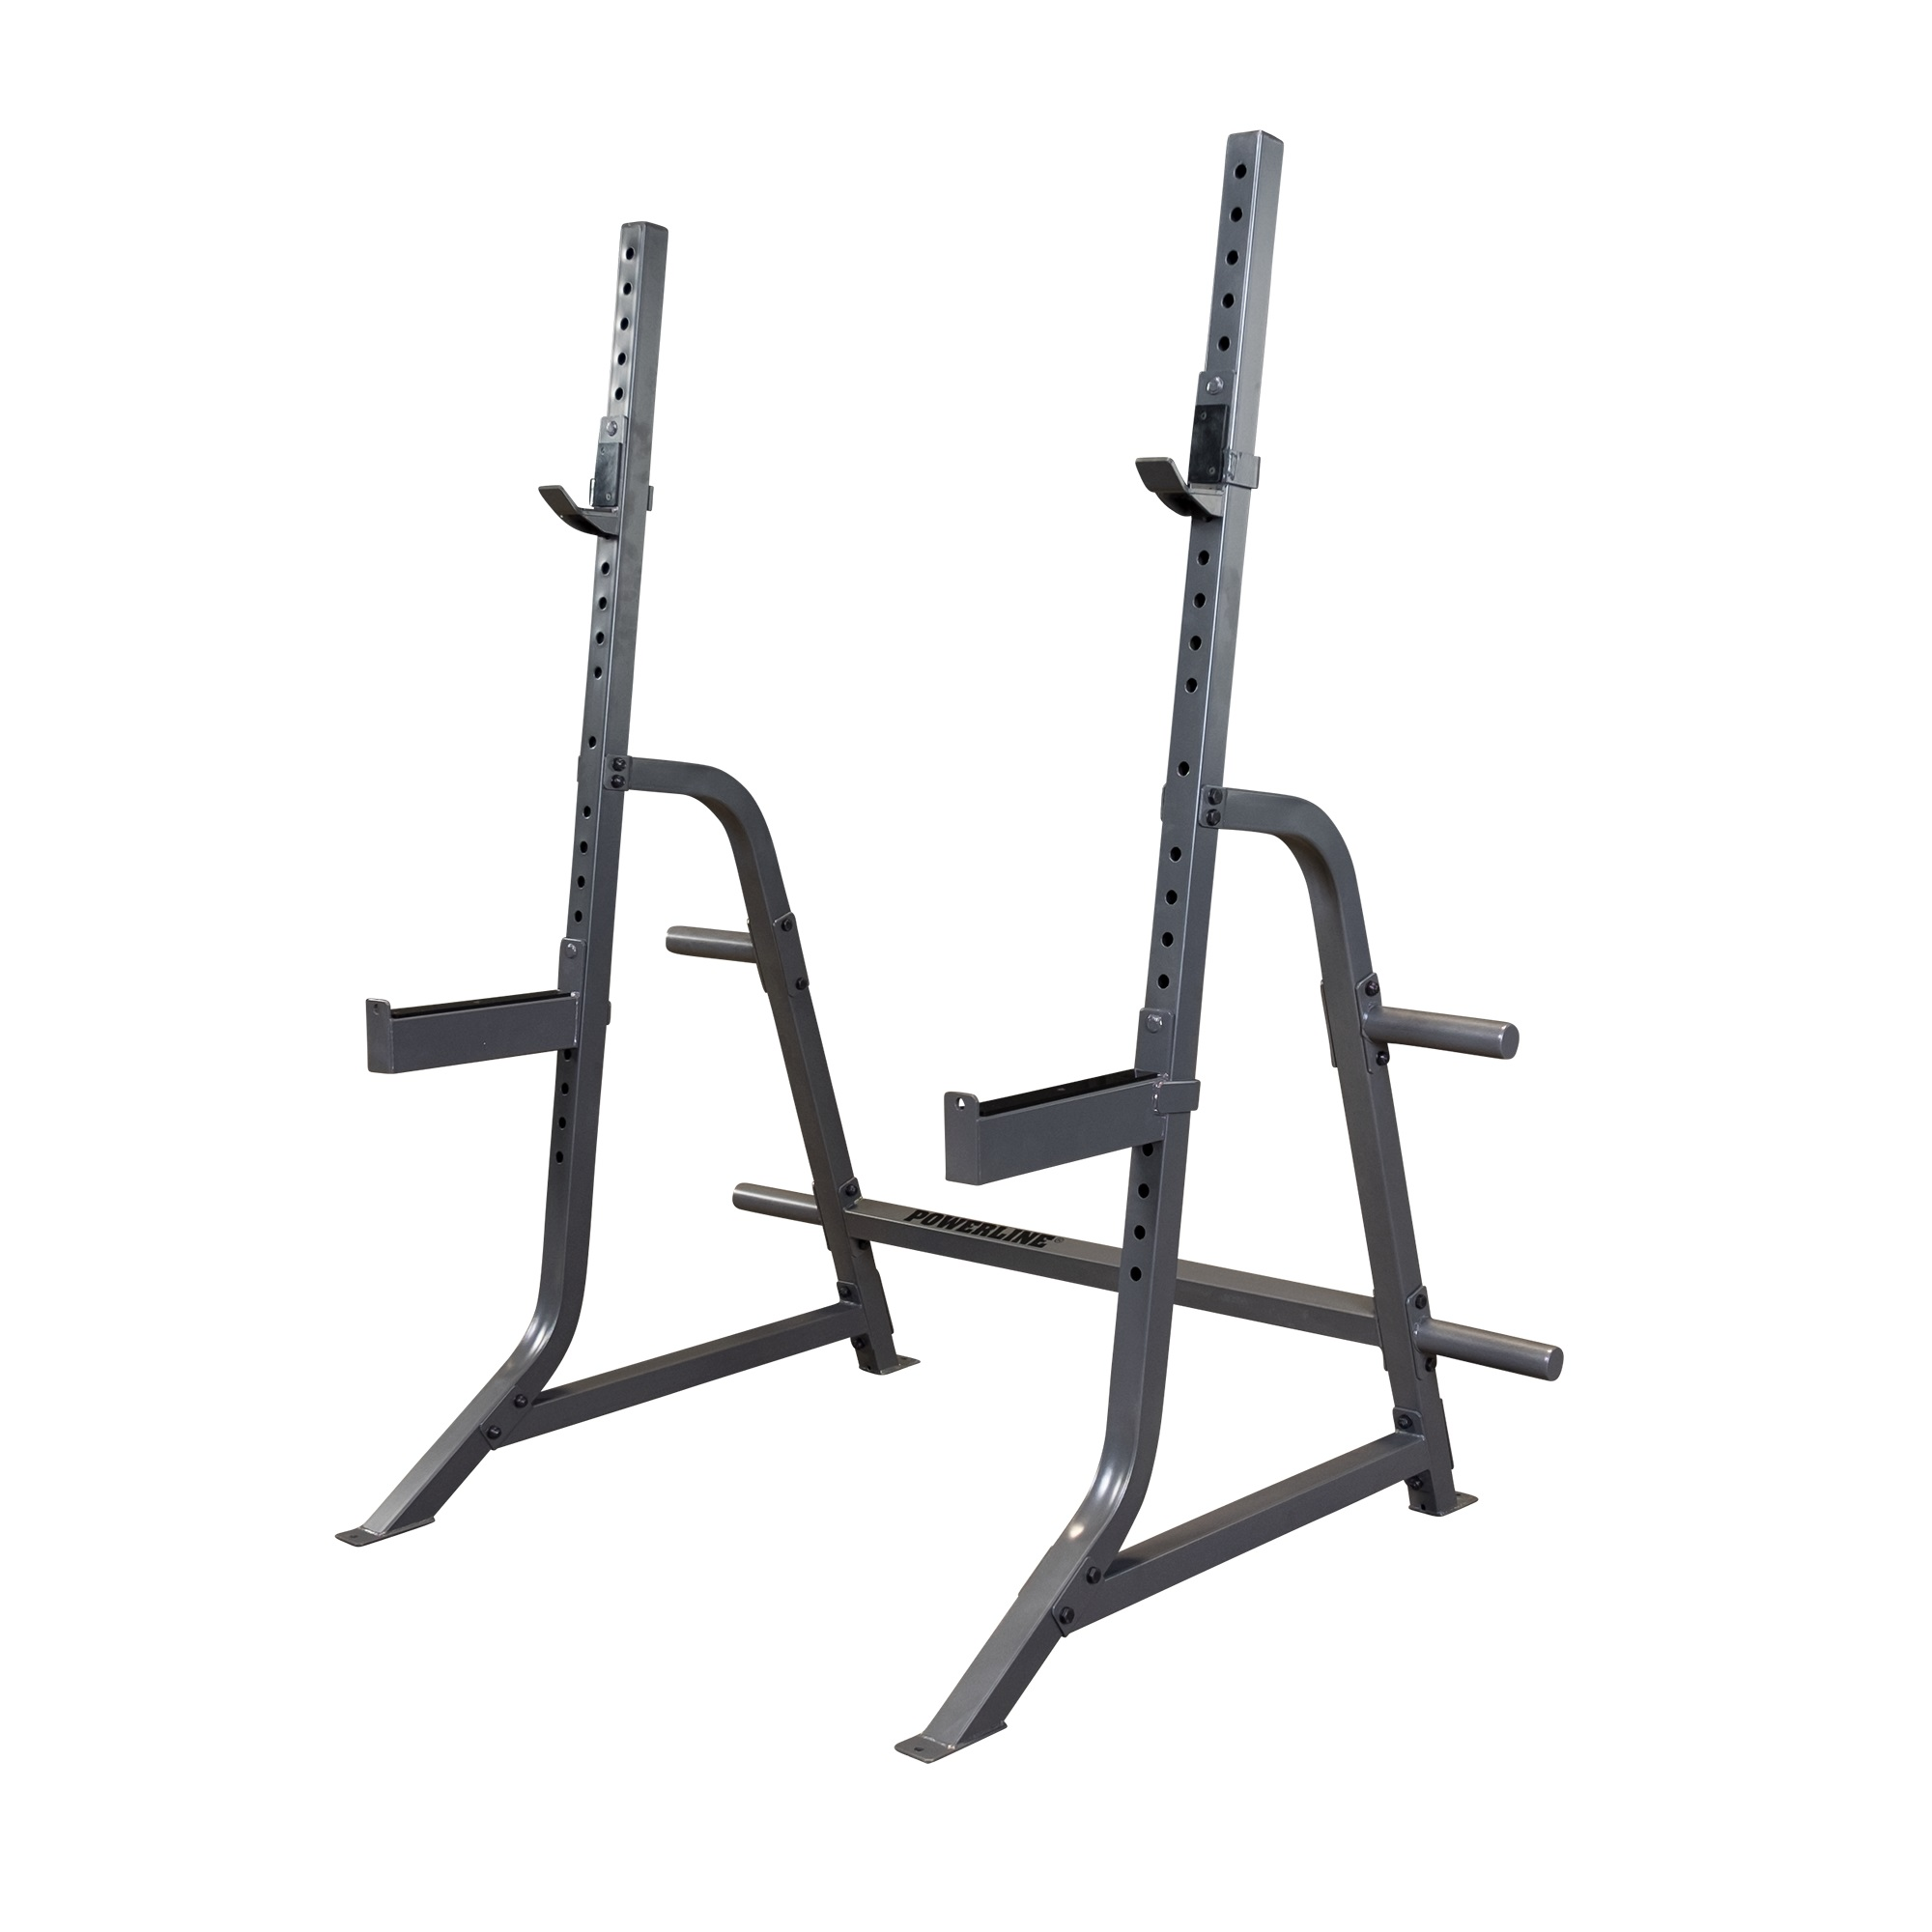 Powerline Multi Press Rack - PMP150 Home Fitness Equipment